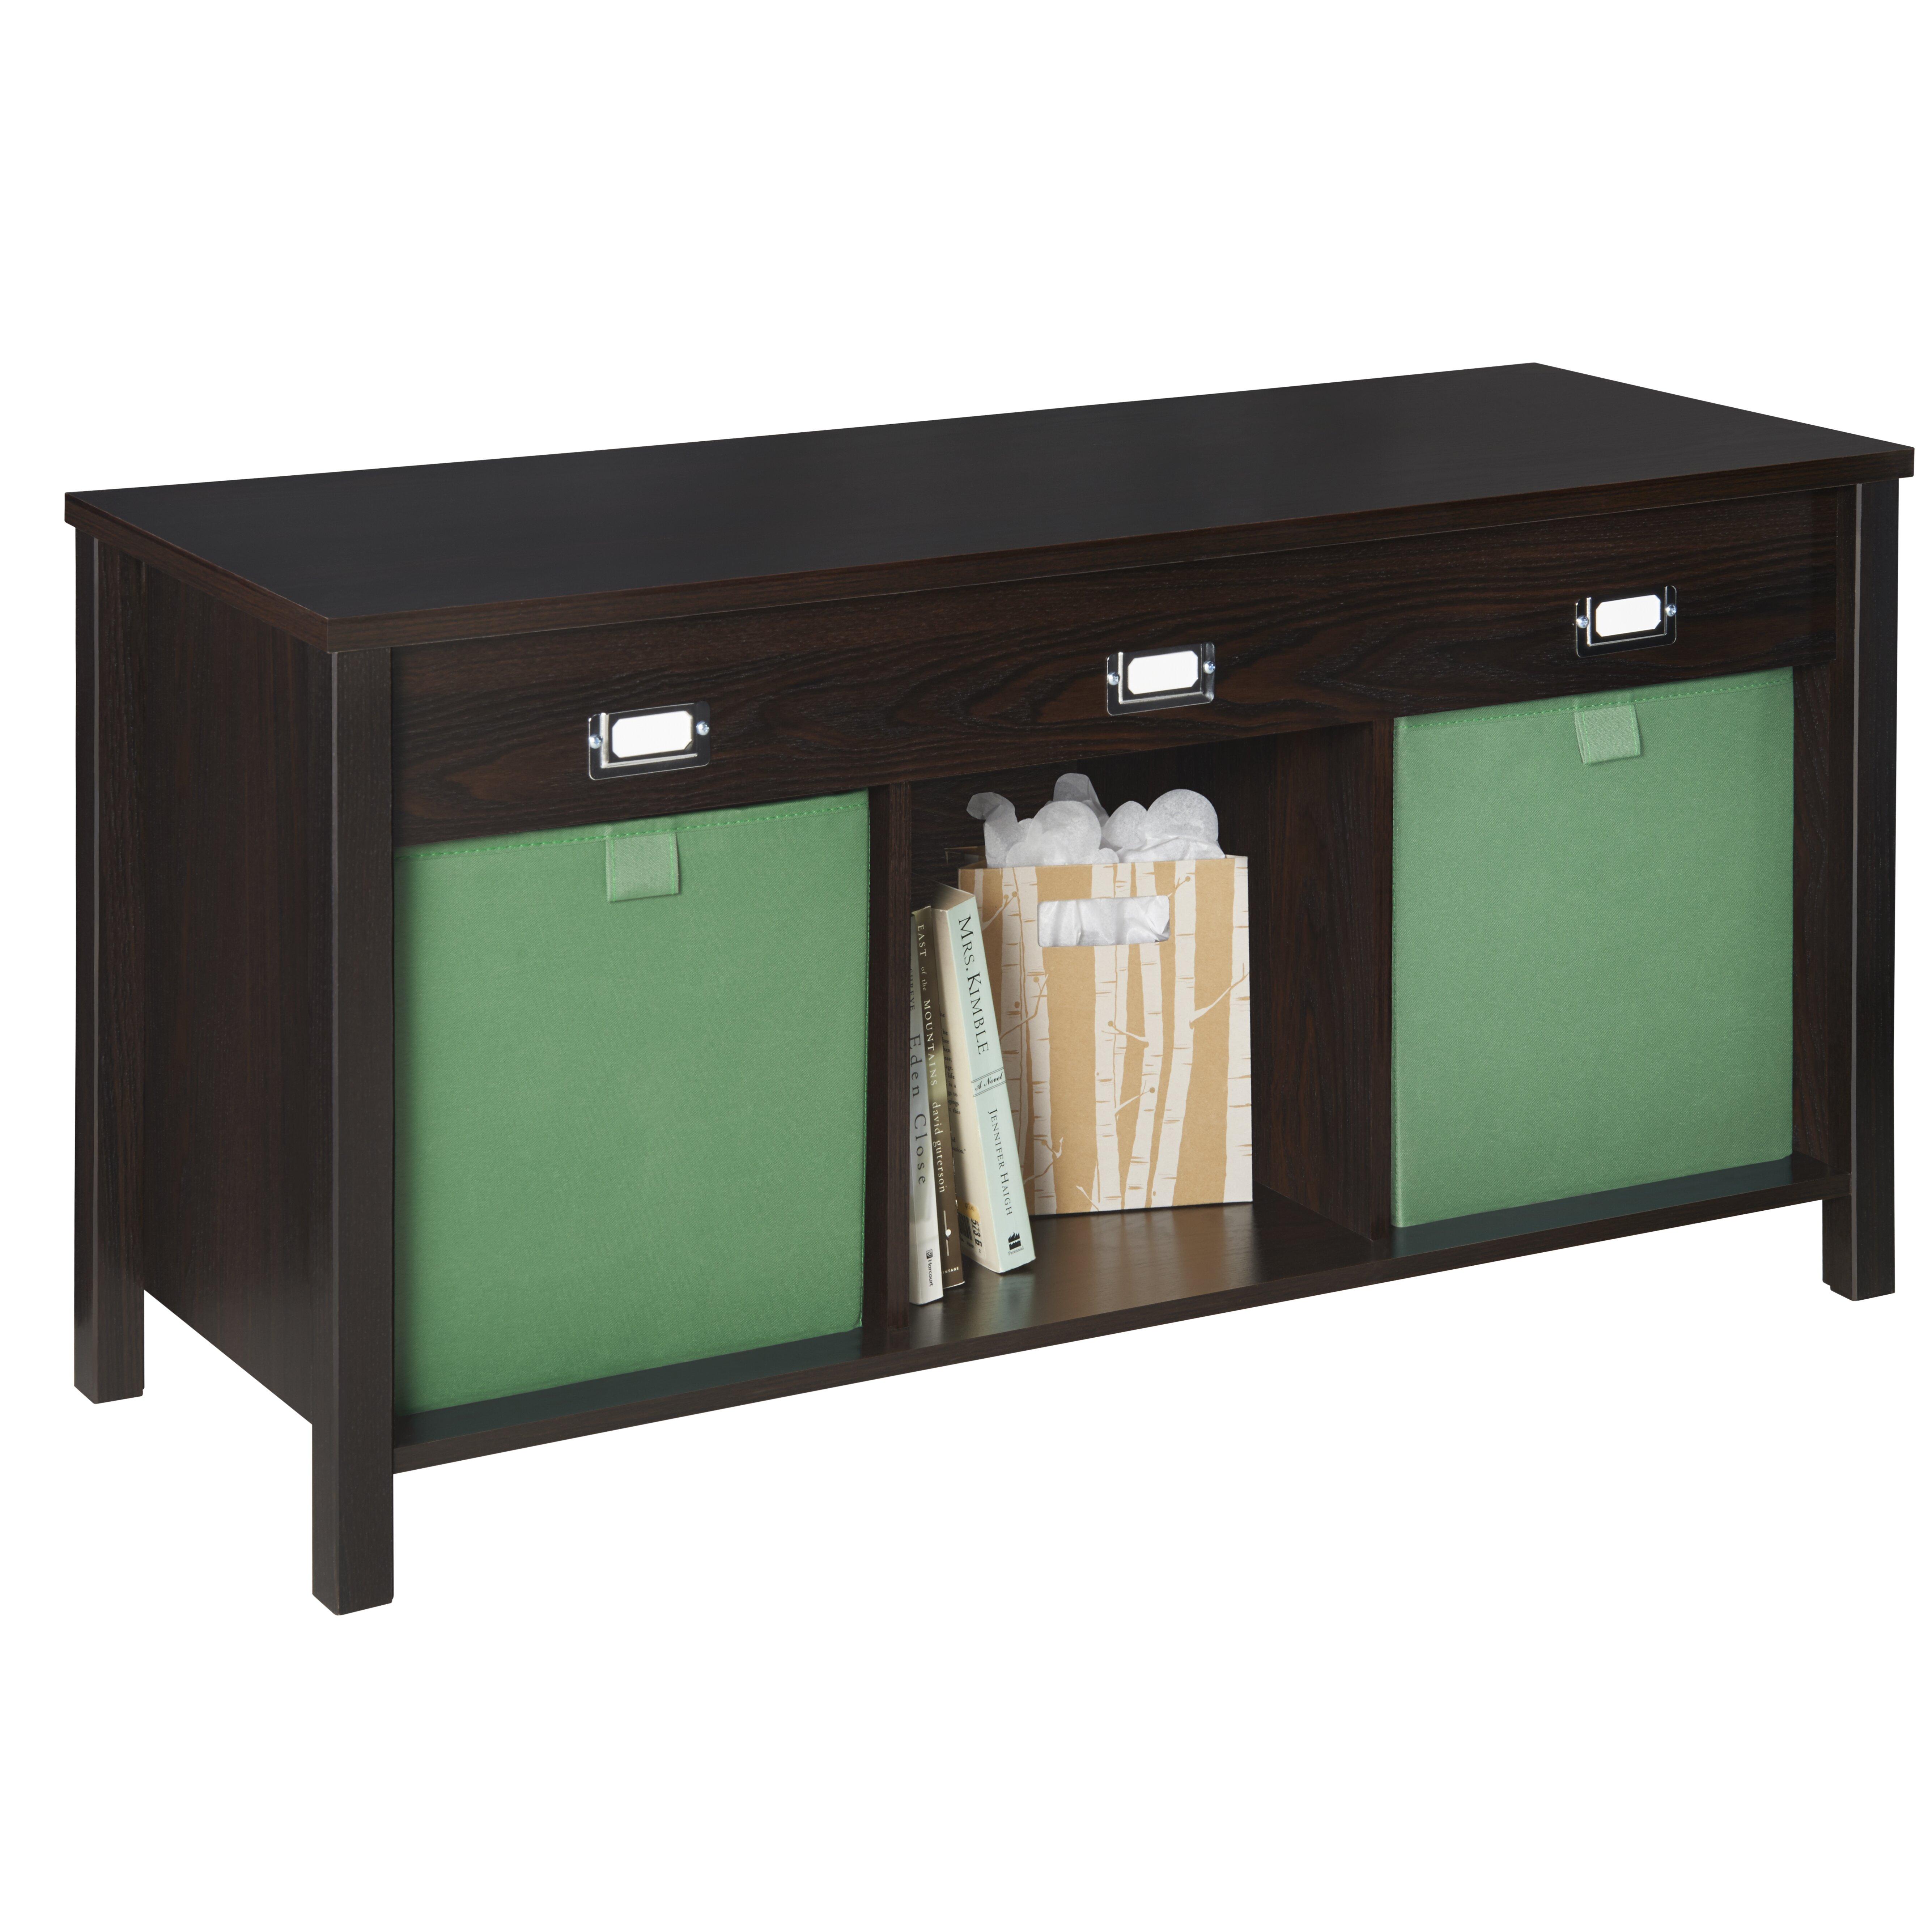 Beautiful Closetmaid Bench Cushion Part - 4: ClosetMaid Premium 3 Cube Storage Entryway Bench